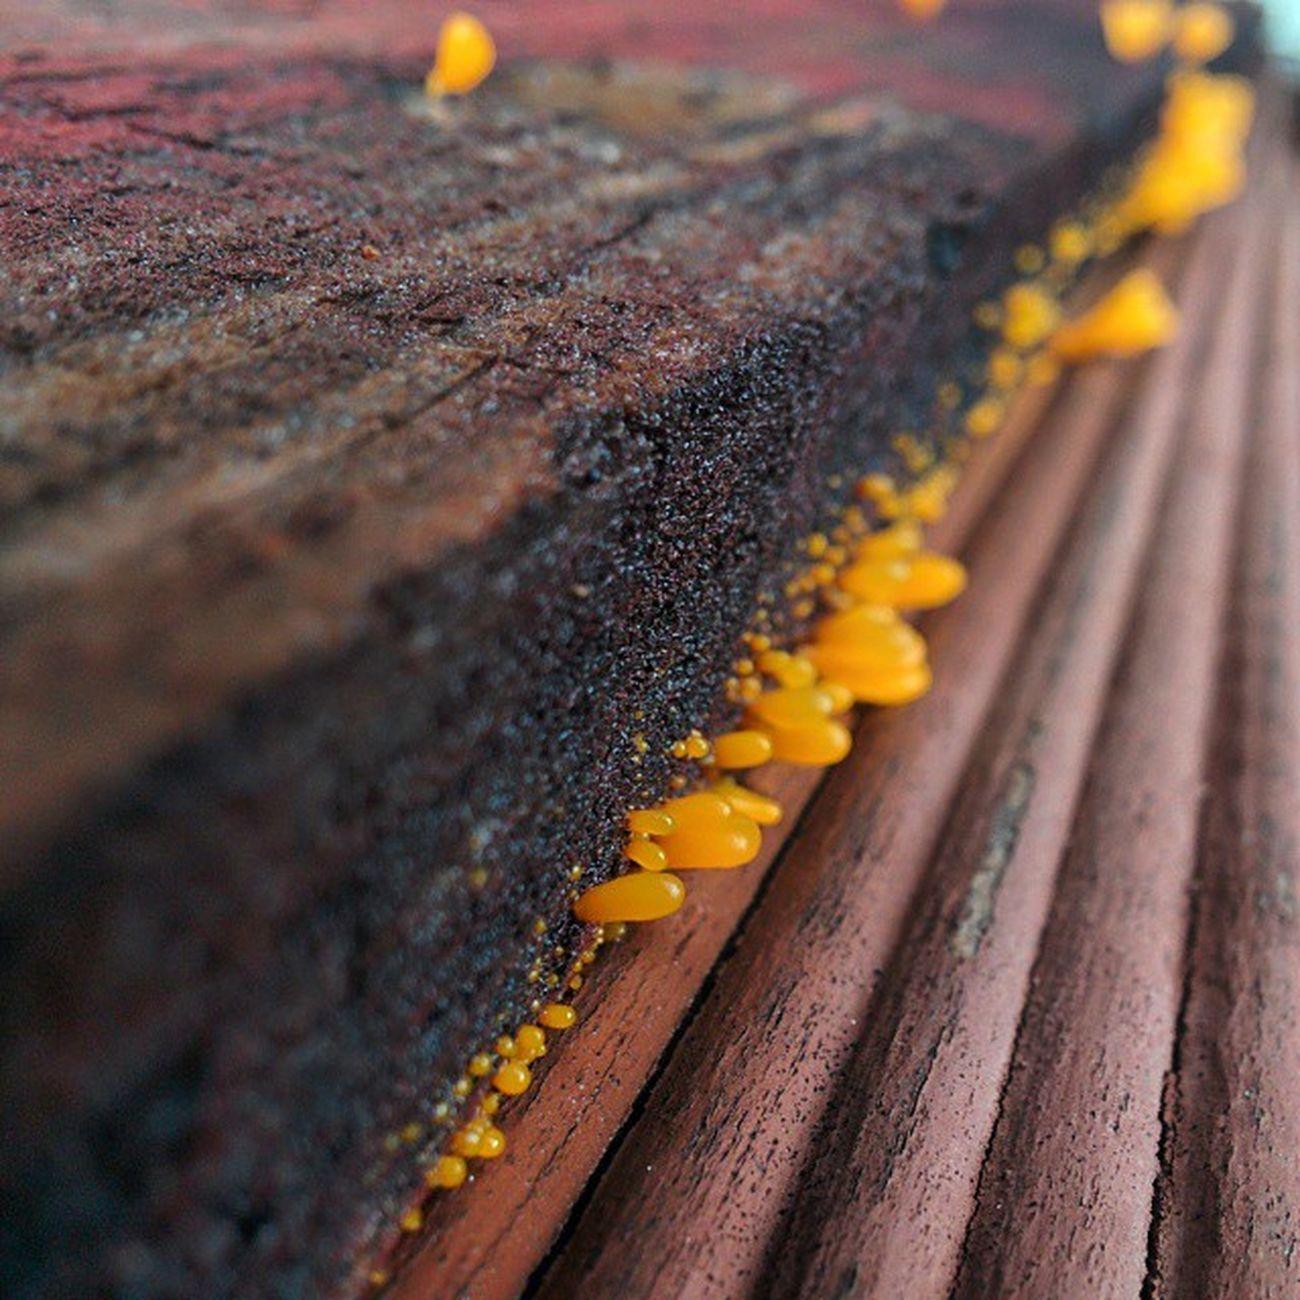 Fungi Fungus Yellow Notsurewhatitis Wood Woodgrain Closeup Nexus5 Hdrplus Nofilter